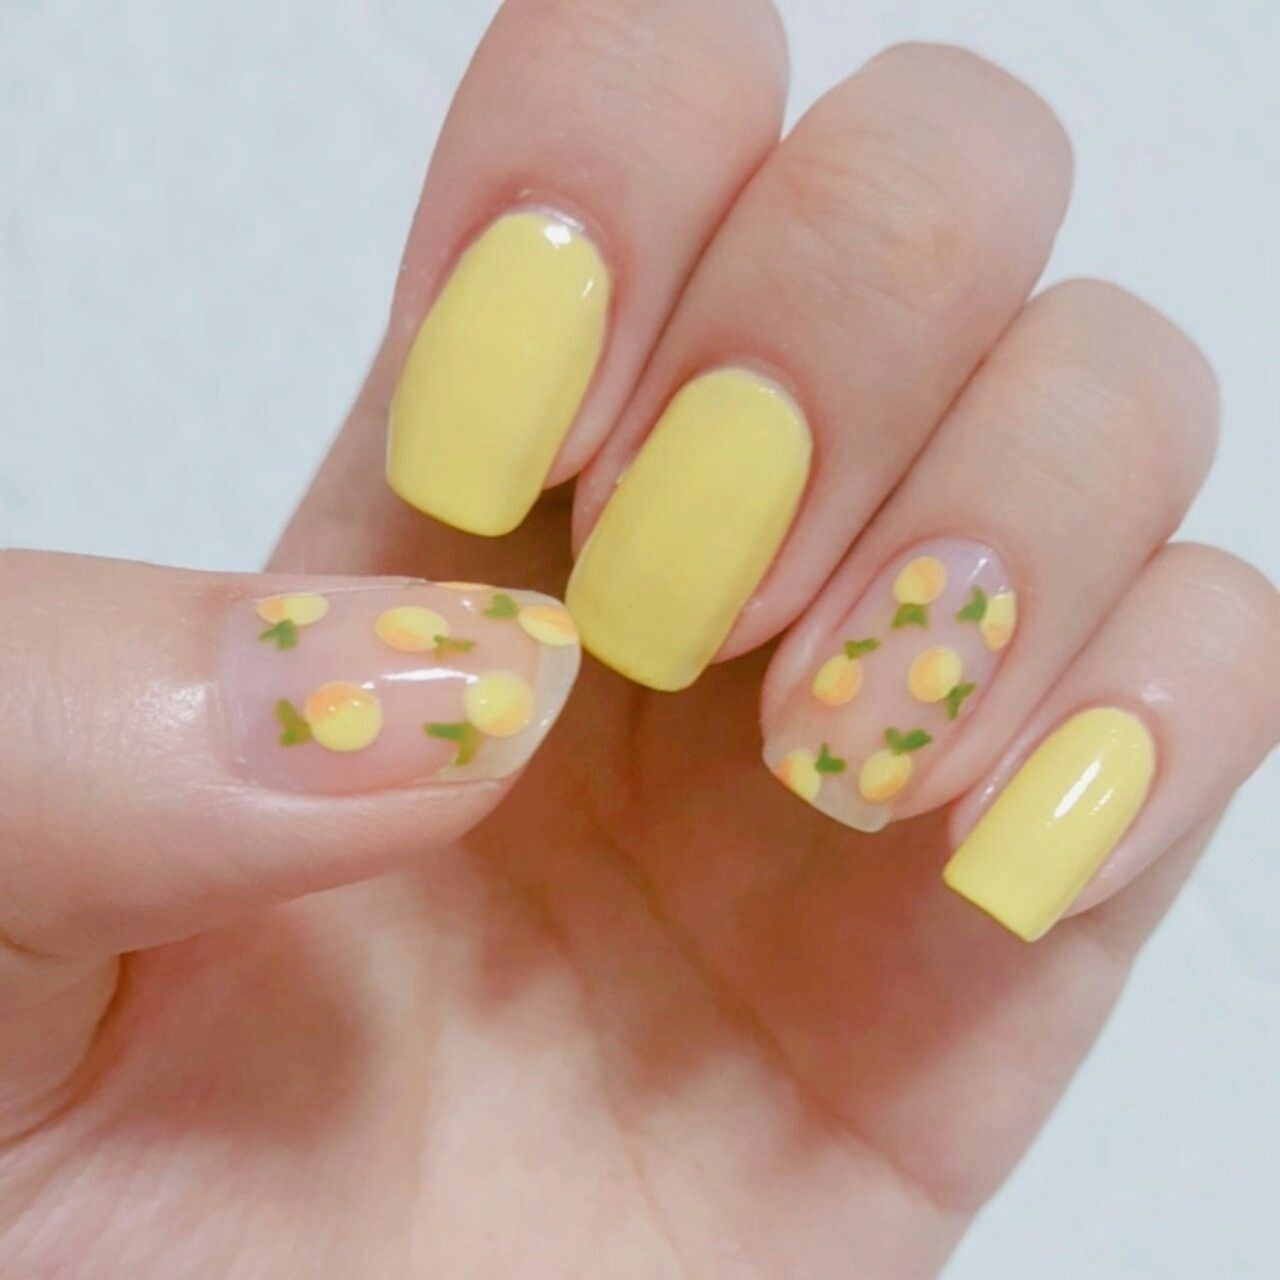 Lemon Nails Yellow Nail Polish With Lemon Accent Nails Jolis Ongles Vernis A Ongles Idees Vernis A Ongles